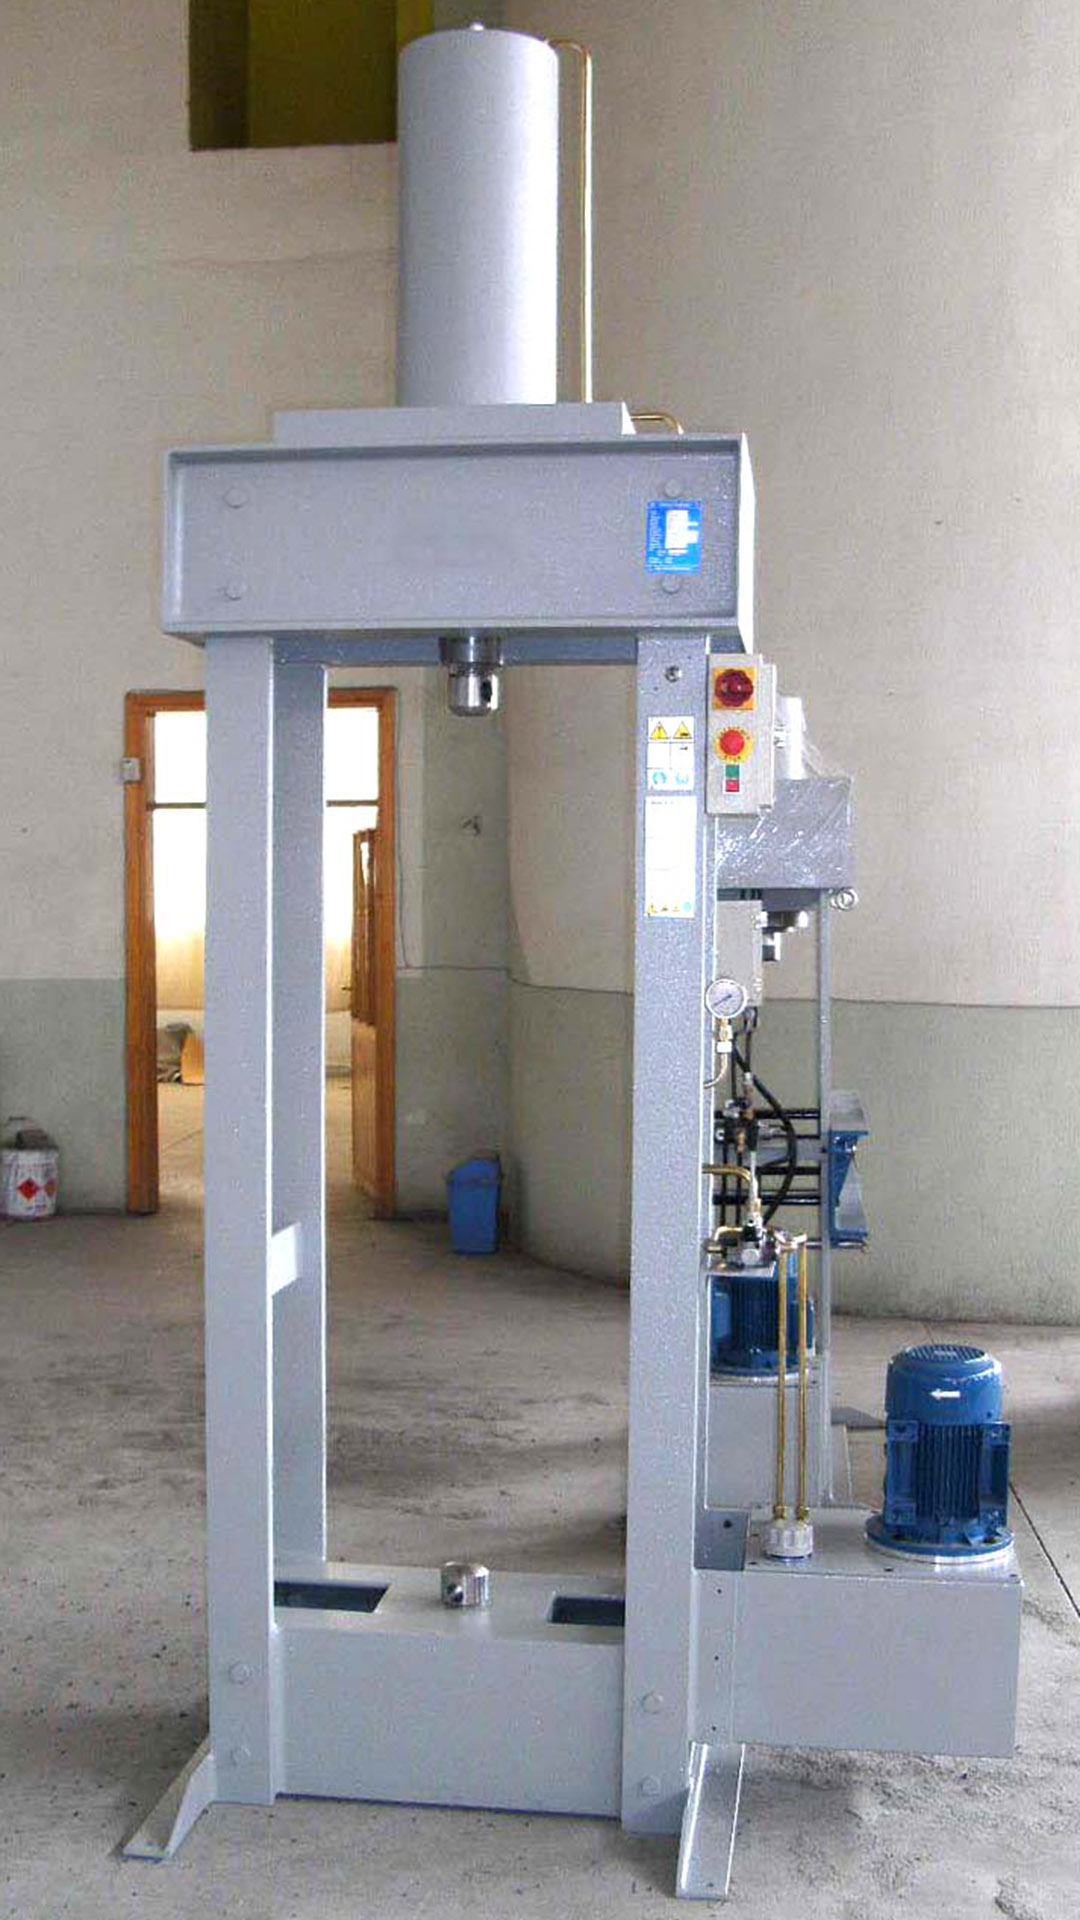 ulbrich-maschinenbau-werkstattpresse